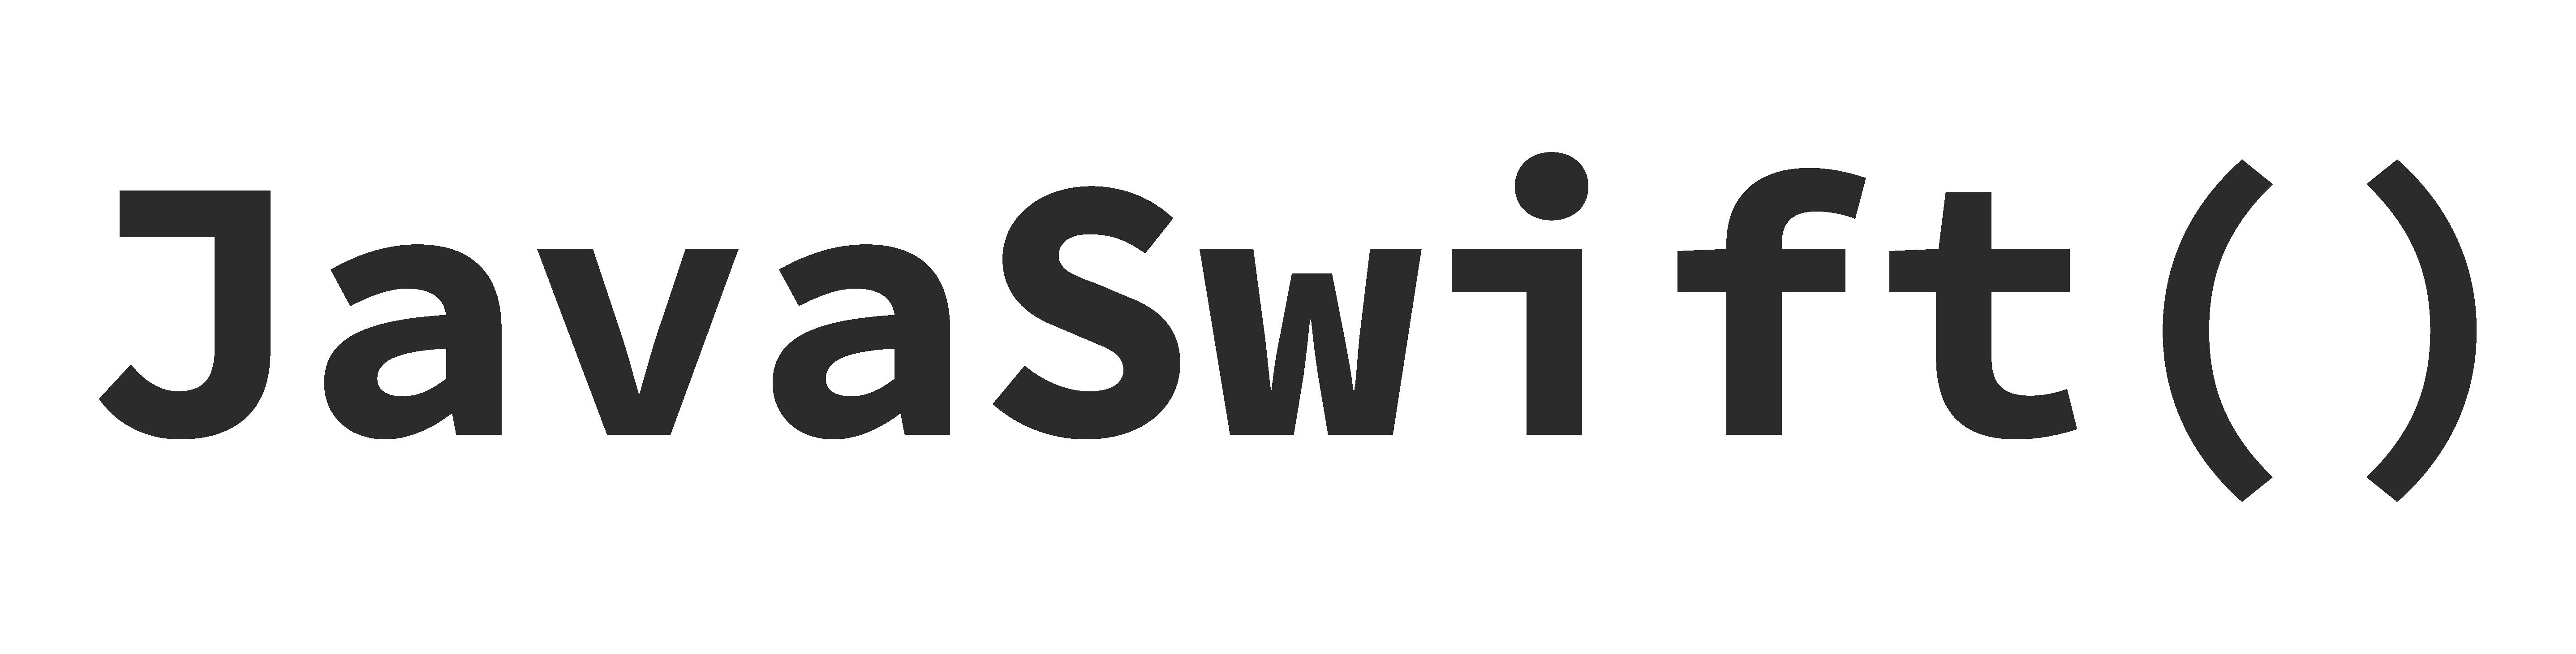 javaswift logo